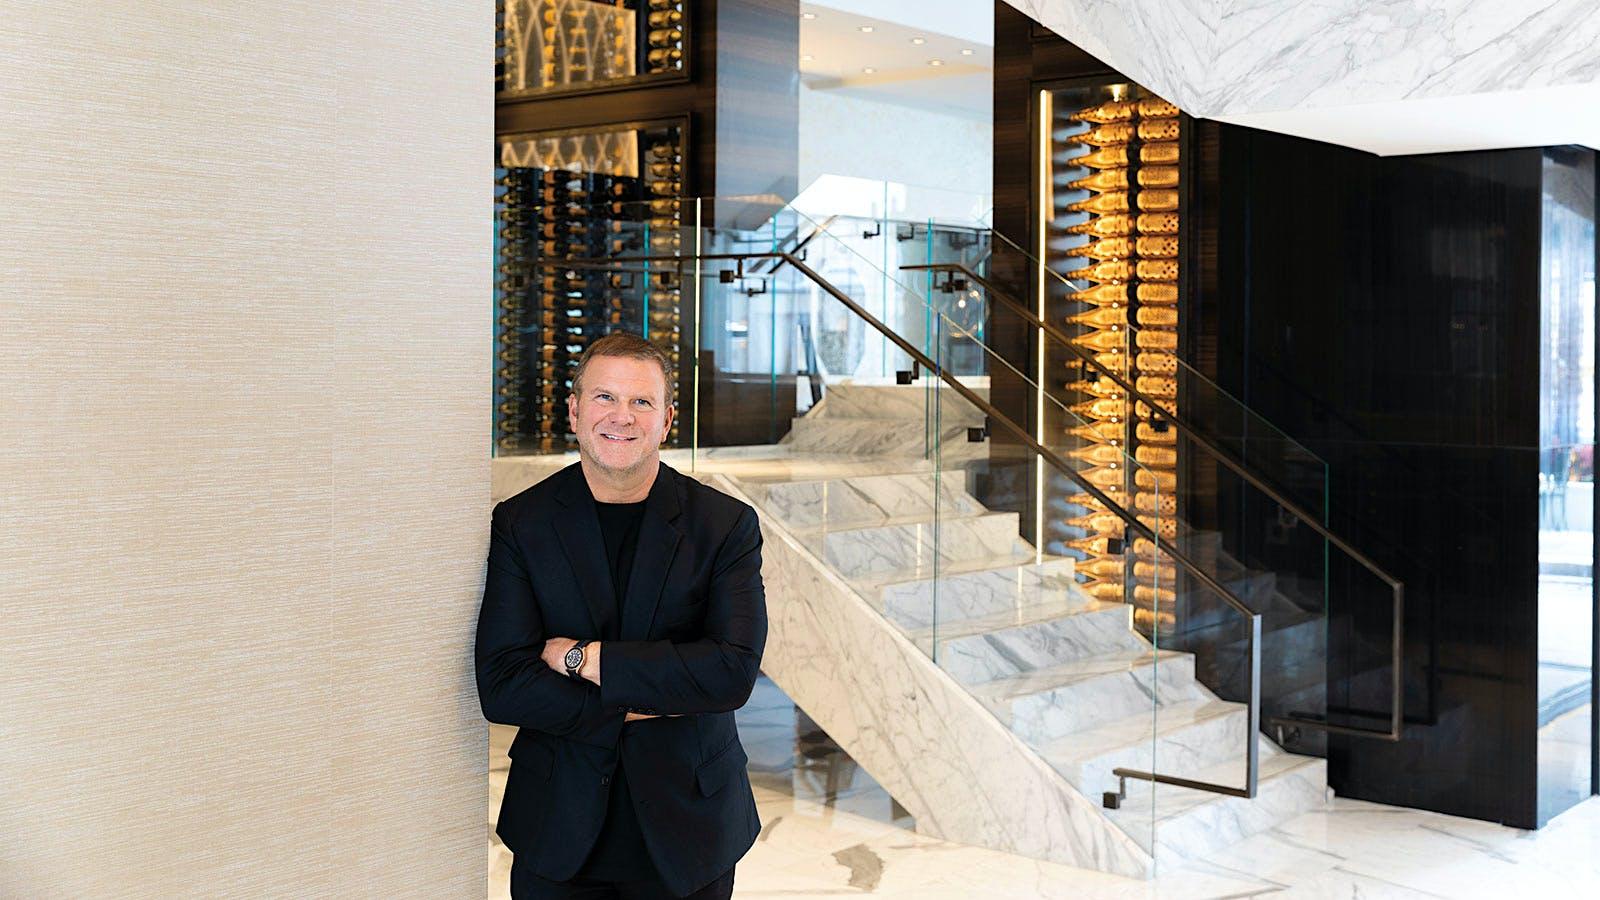 Tilman Fertitta Bets Big On Wine